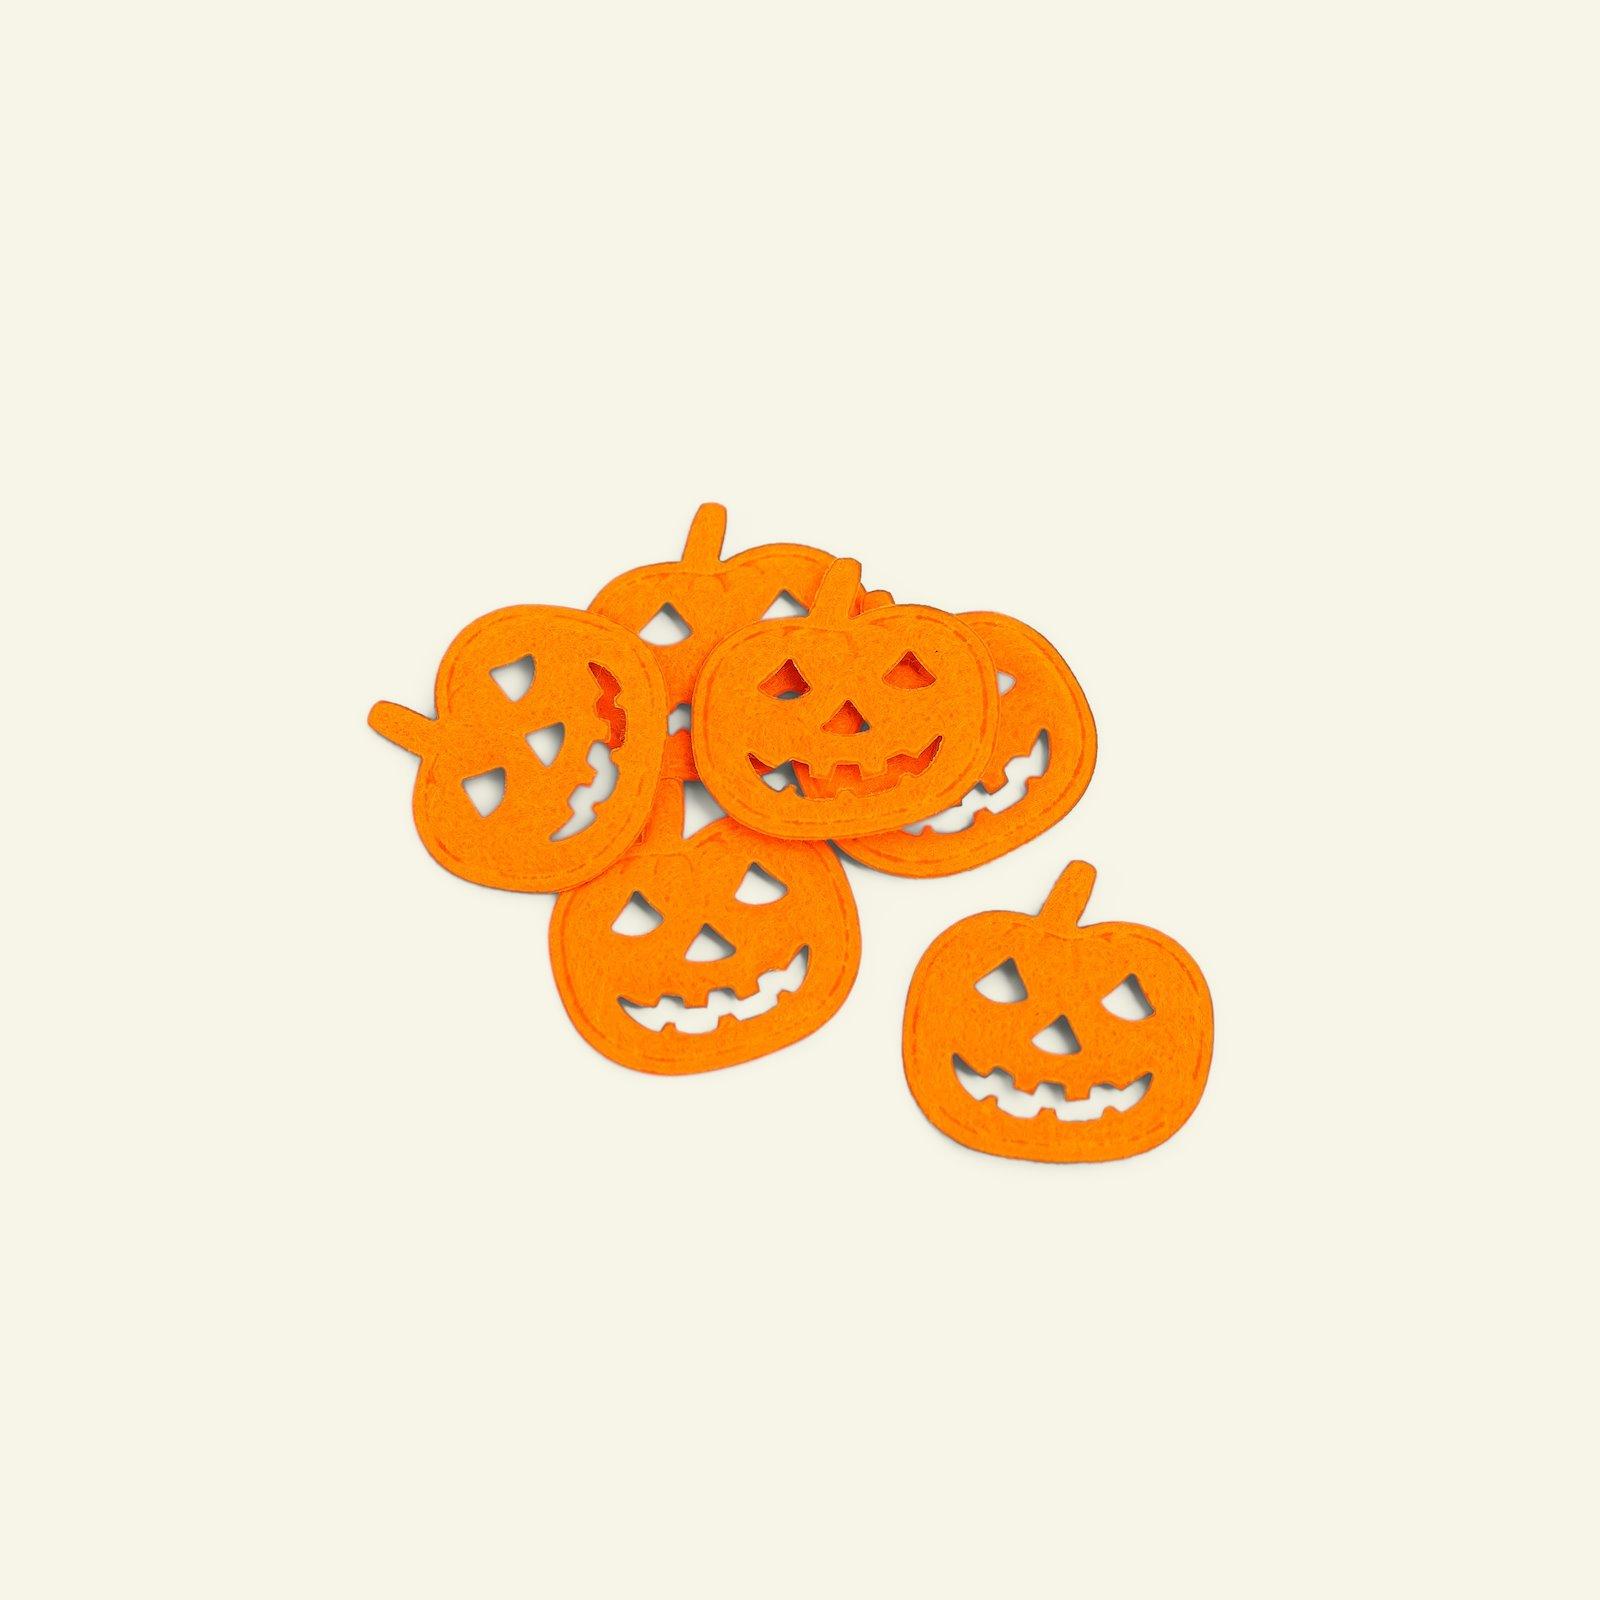 Deco pumpkin 30x30mm orange 6pcs 26460_pack